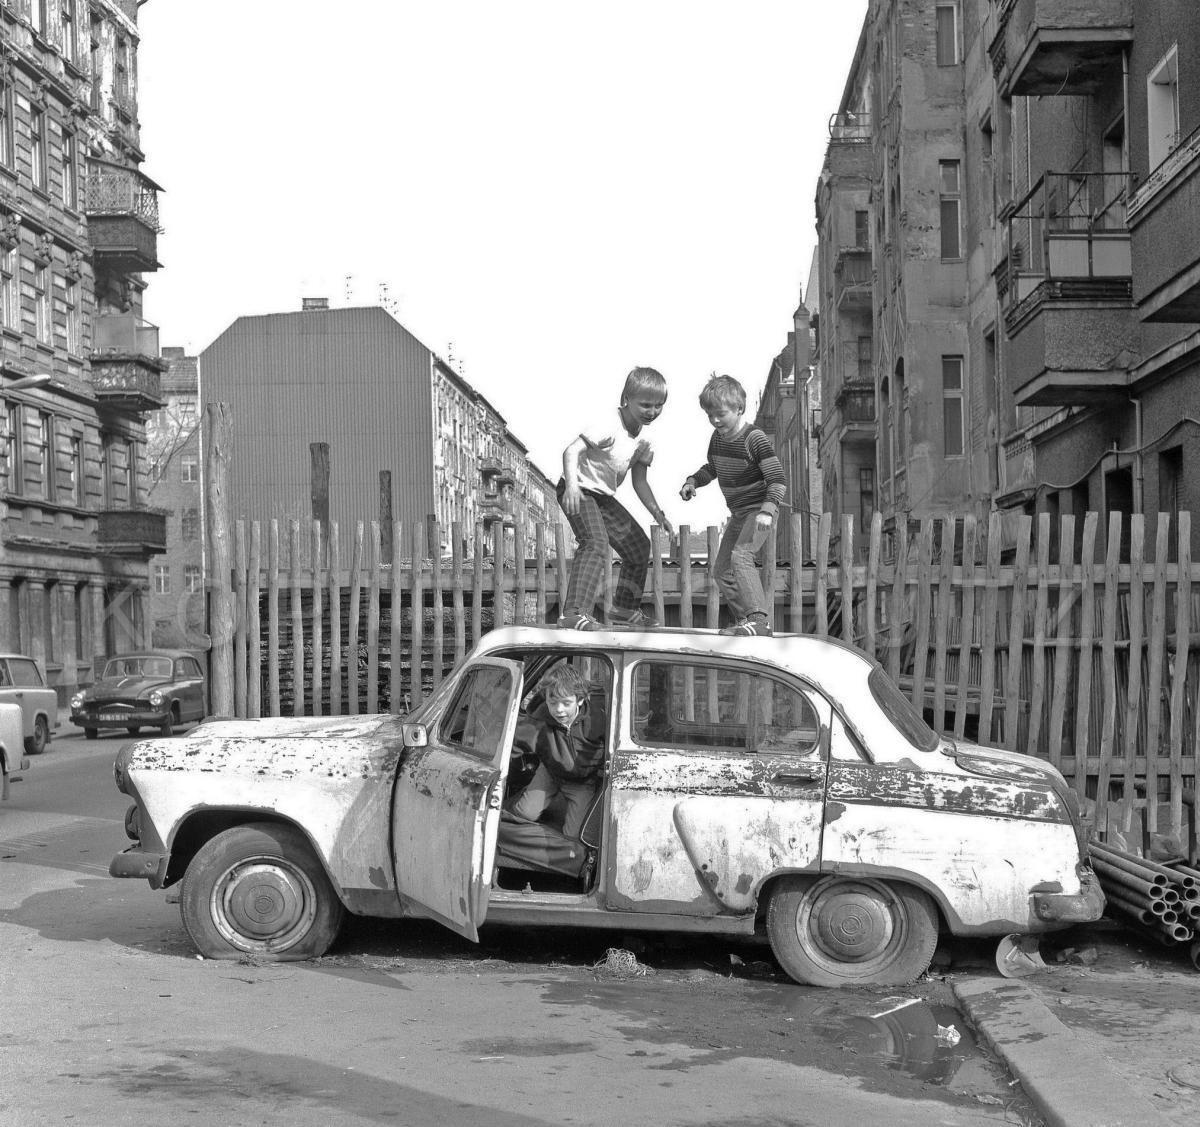 Nr06-069_Prenzlauer-Berg-1985